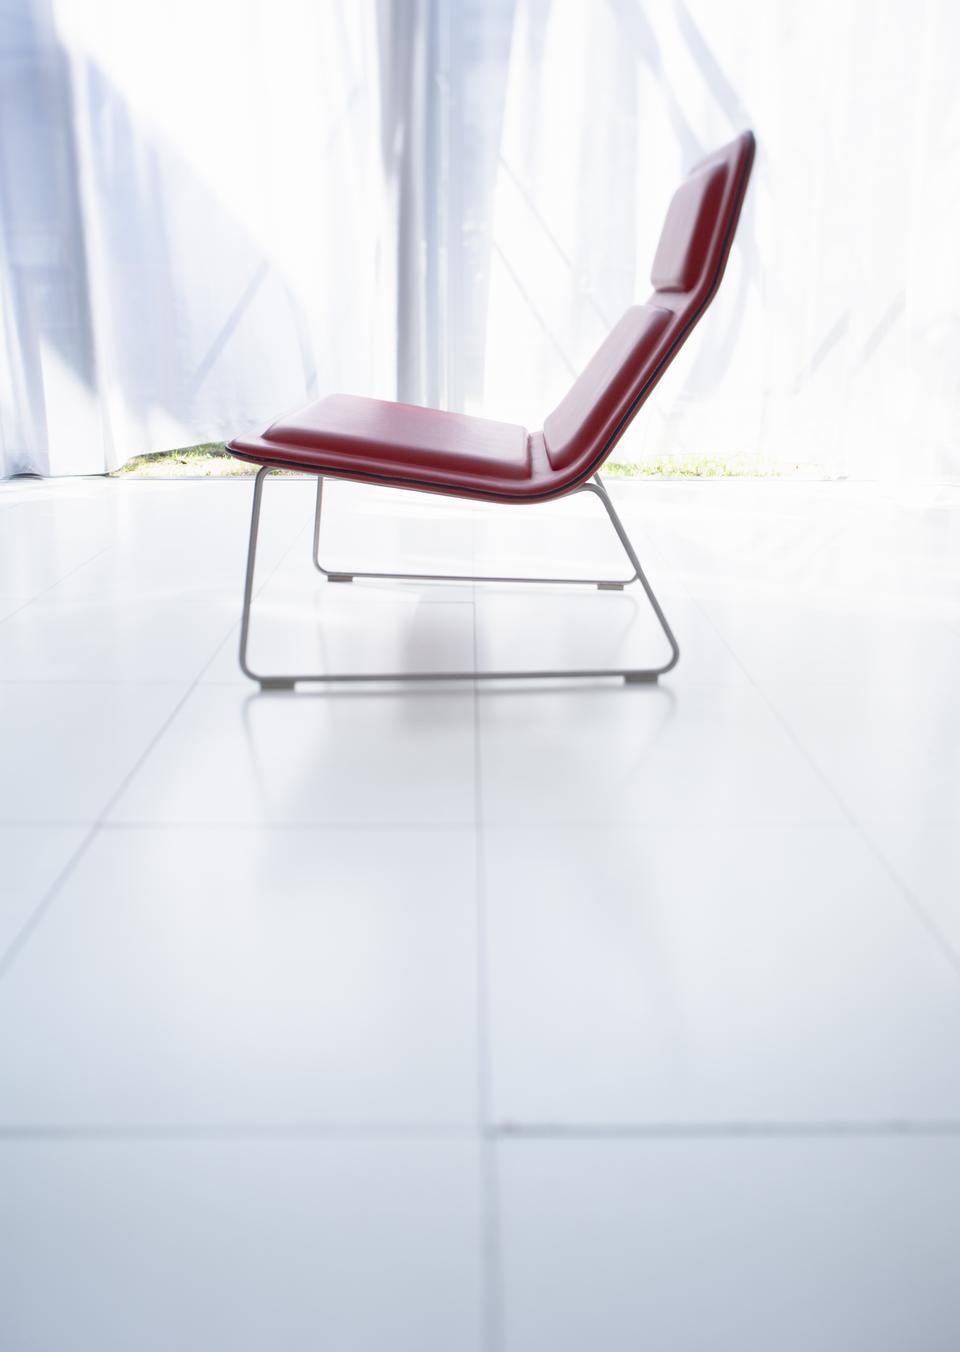 Comfort chair background big window